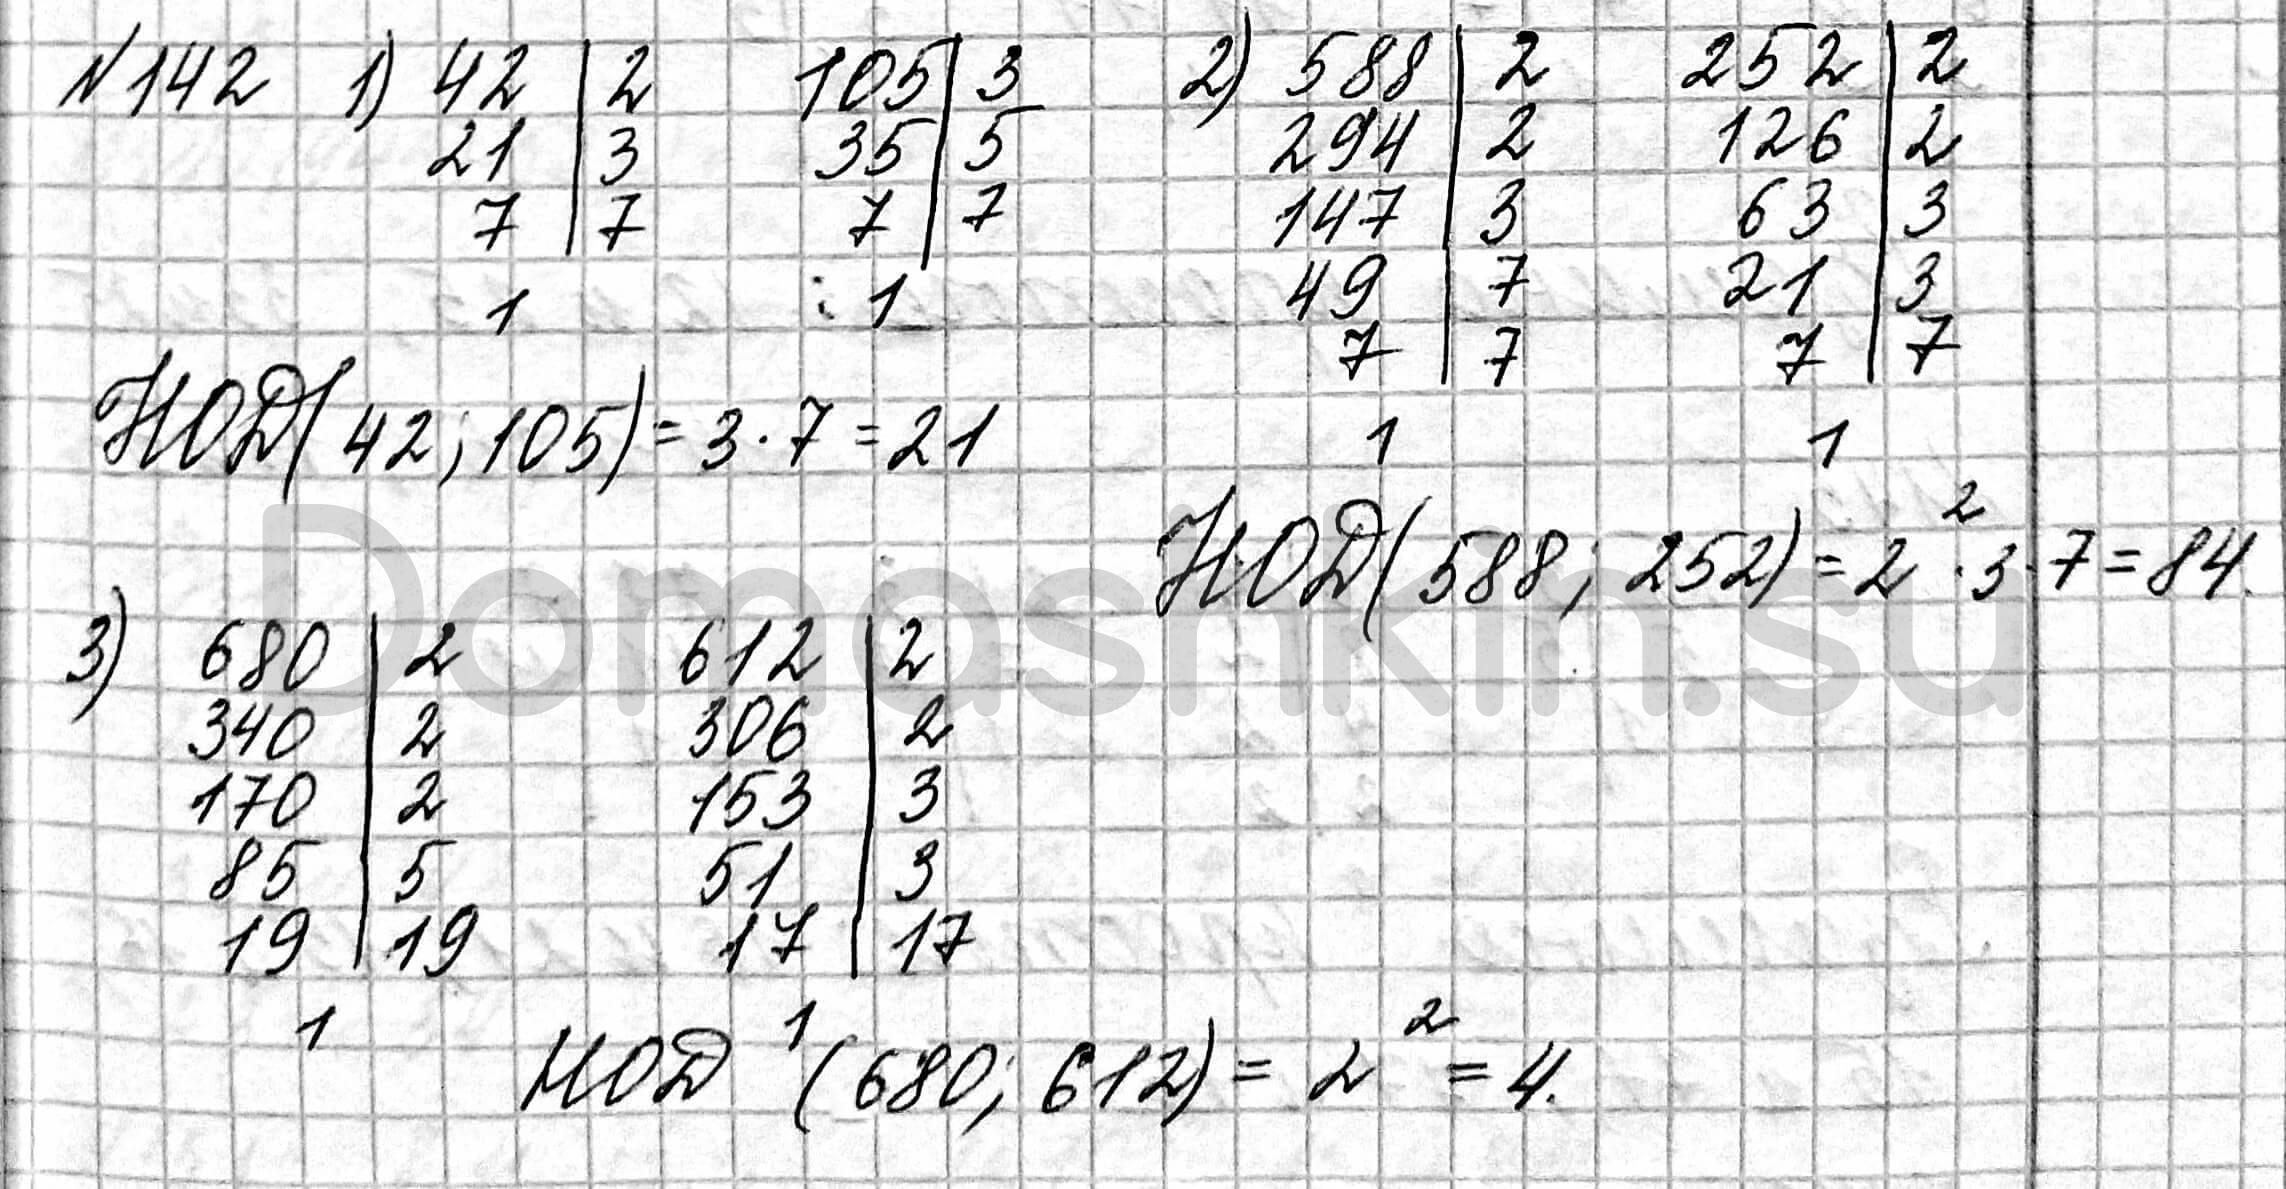 Математика 6 класс учебник Мерзляк номер 142 решение